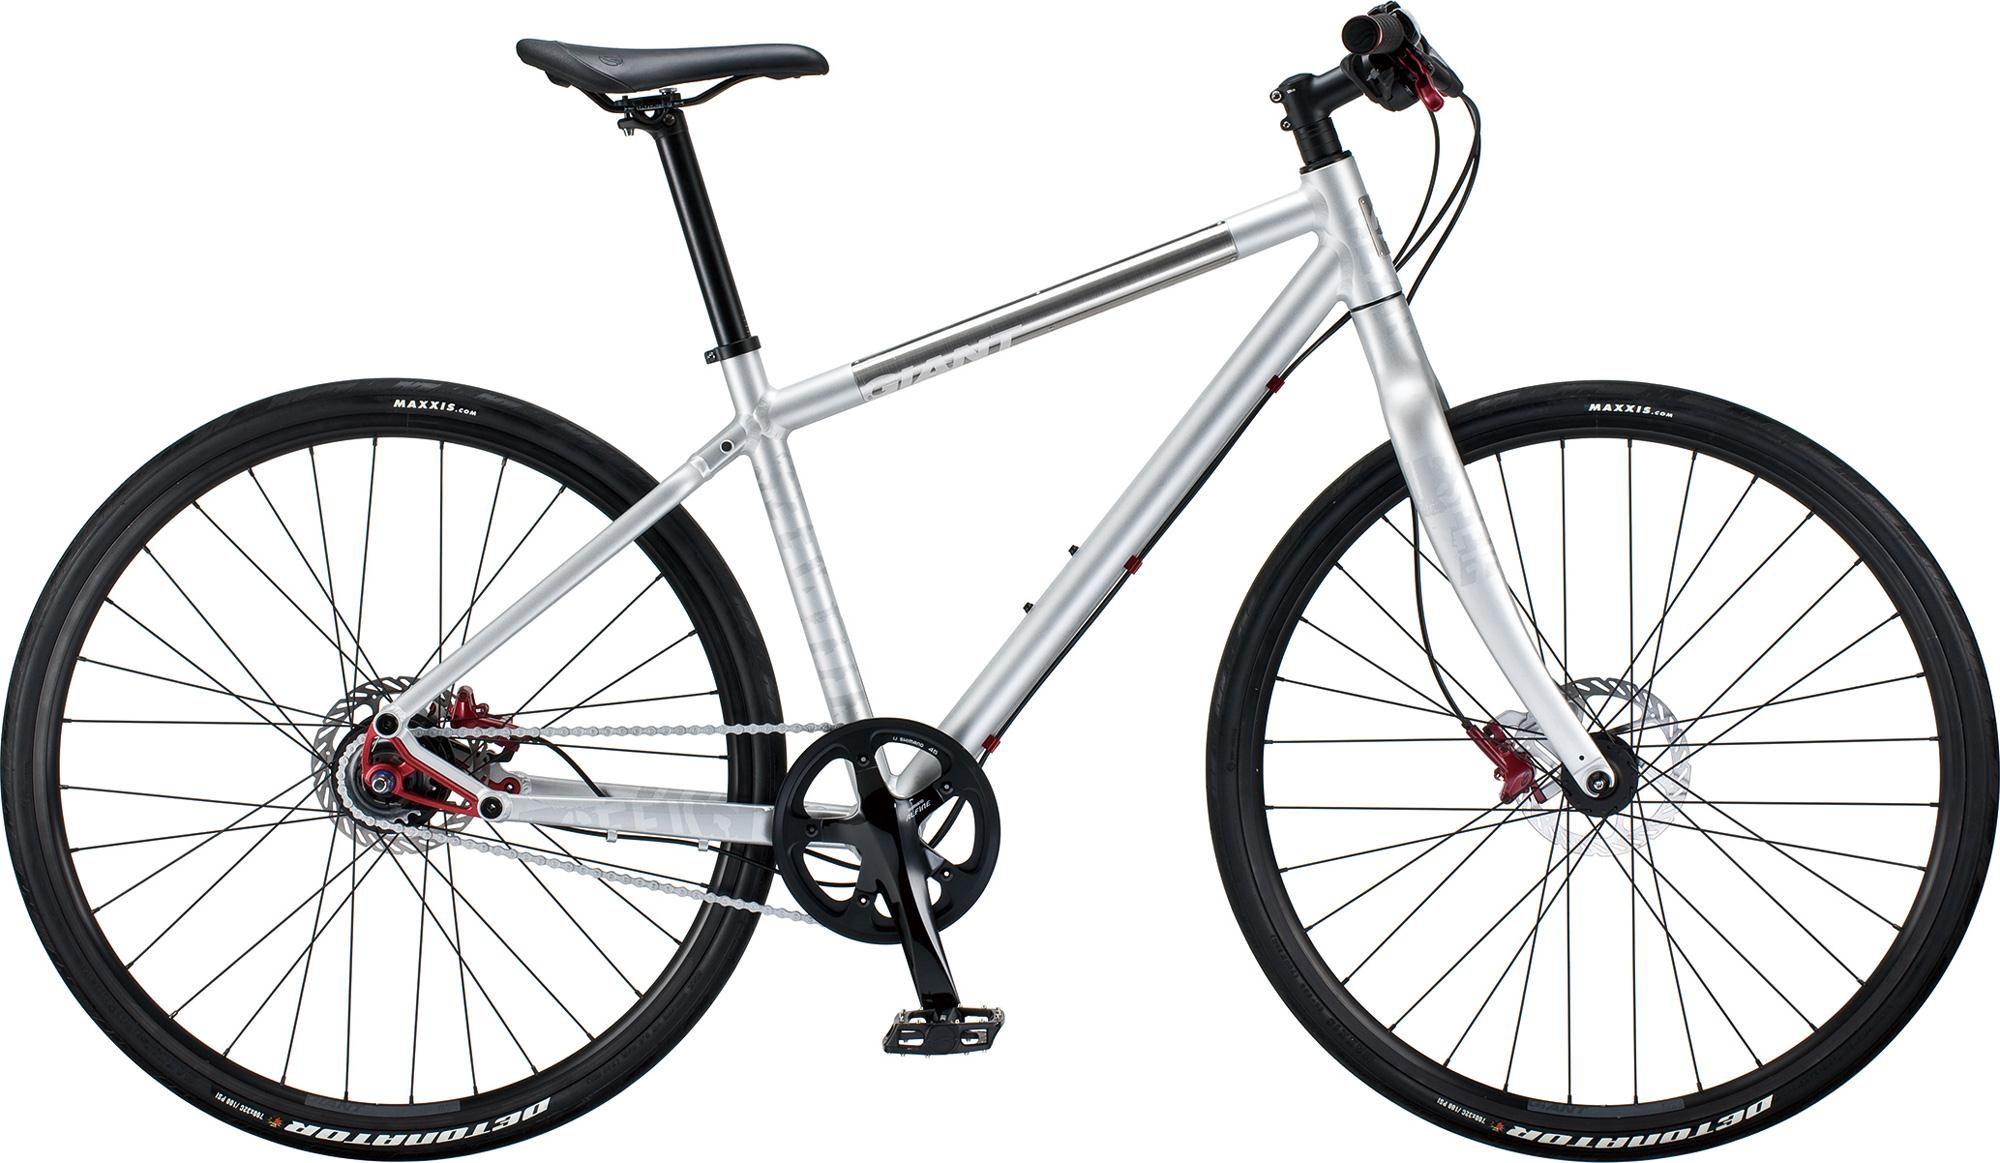 Giant Seek 0 New Bike Possible Candidates Pinterest Bicycling